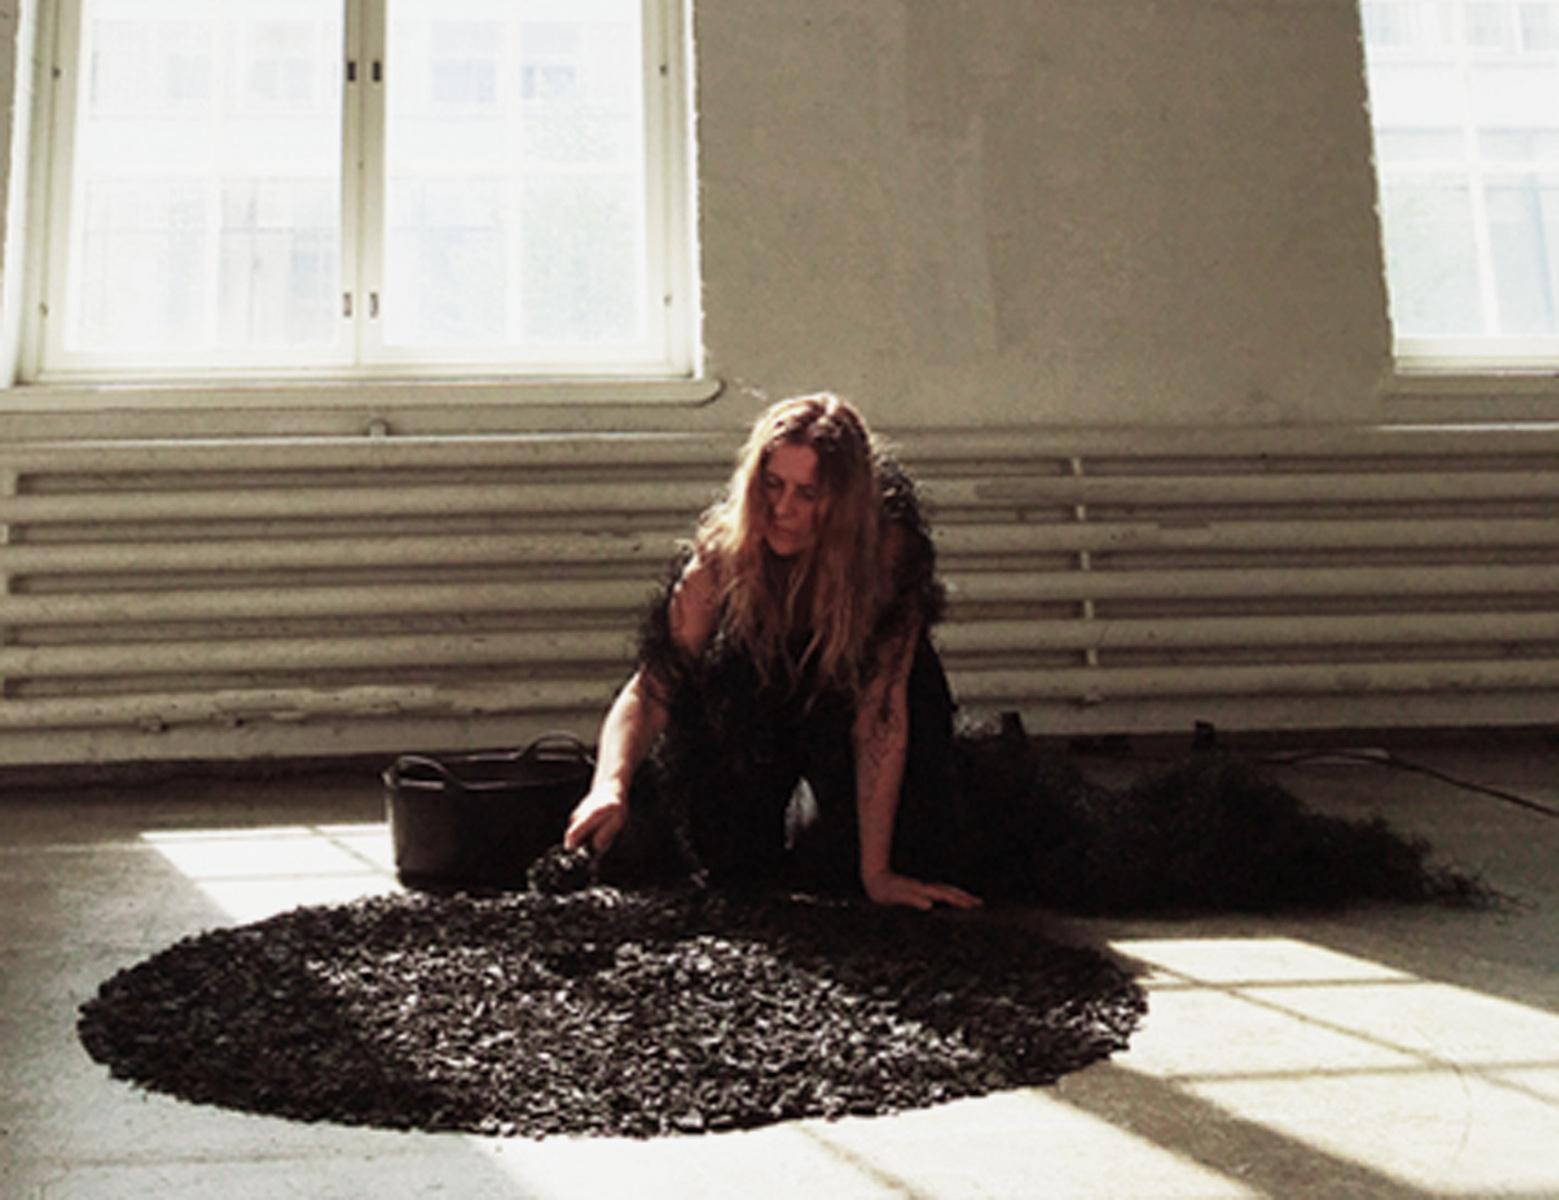 Katarina Elvira Gudrunsdotter - The Gardener, Performance, Day 3, Art Fair Suomi 2019, Cable Factory, Helsinki, Guest Artist Galleri Konstepidemin